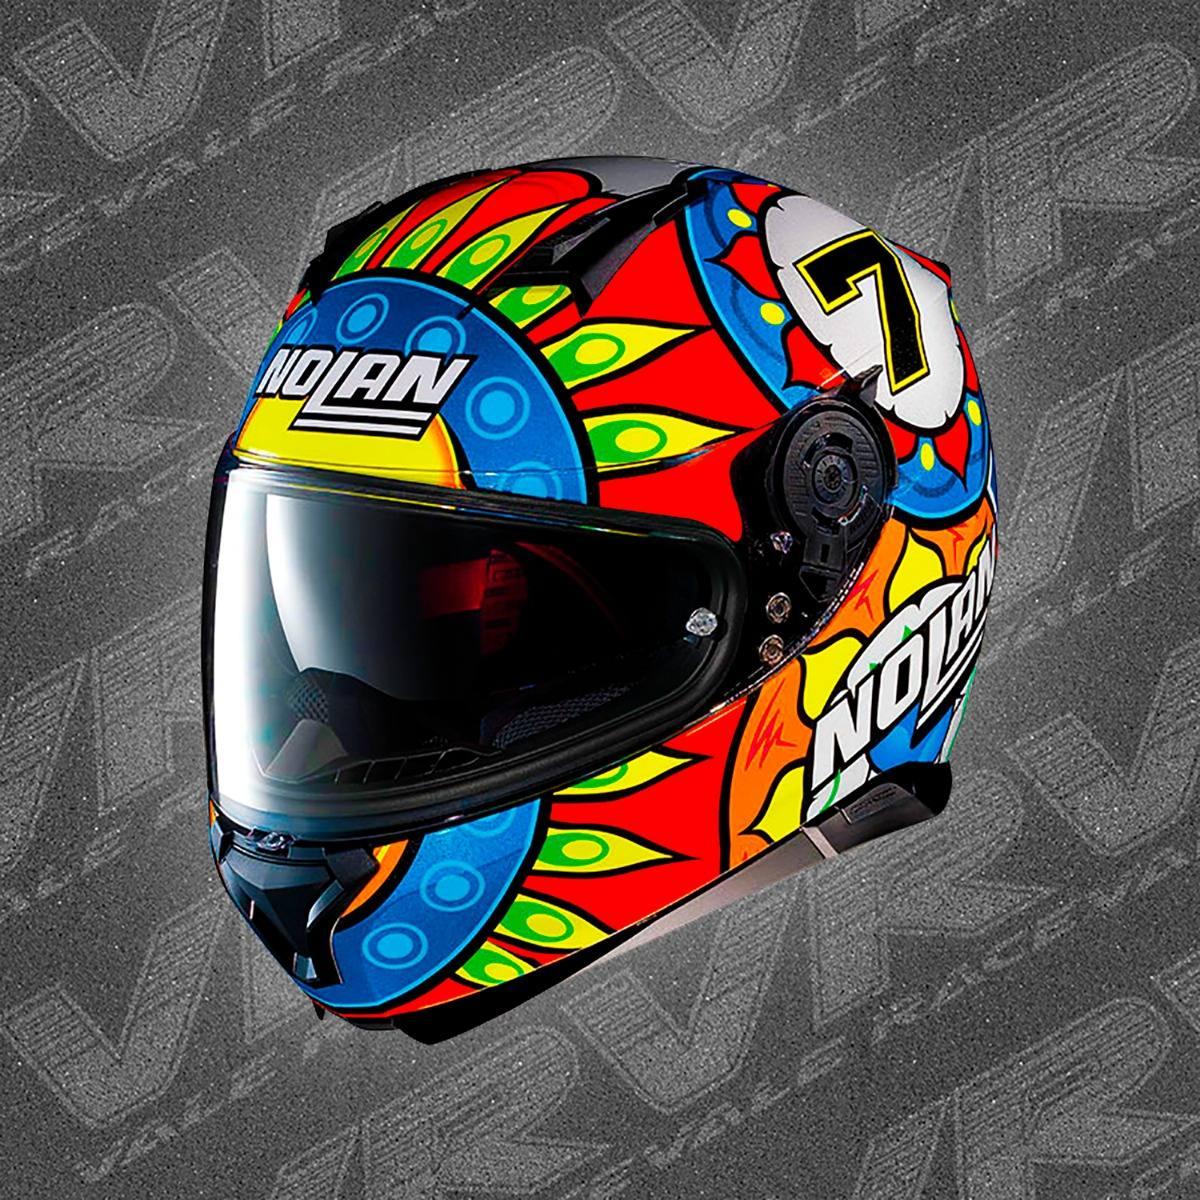 capacete-nolan-n87-chaz-davies-metal-bla